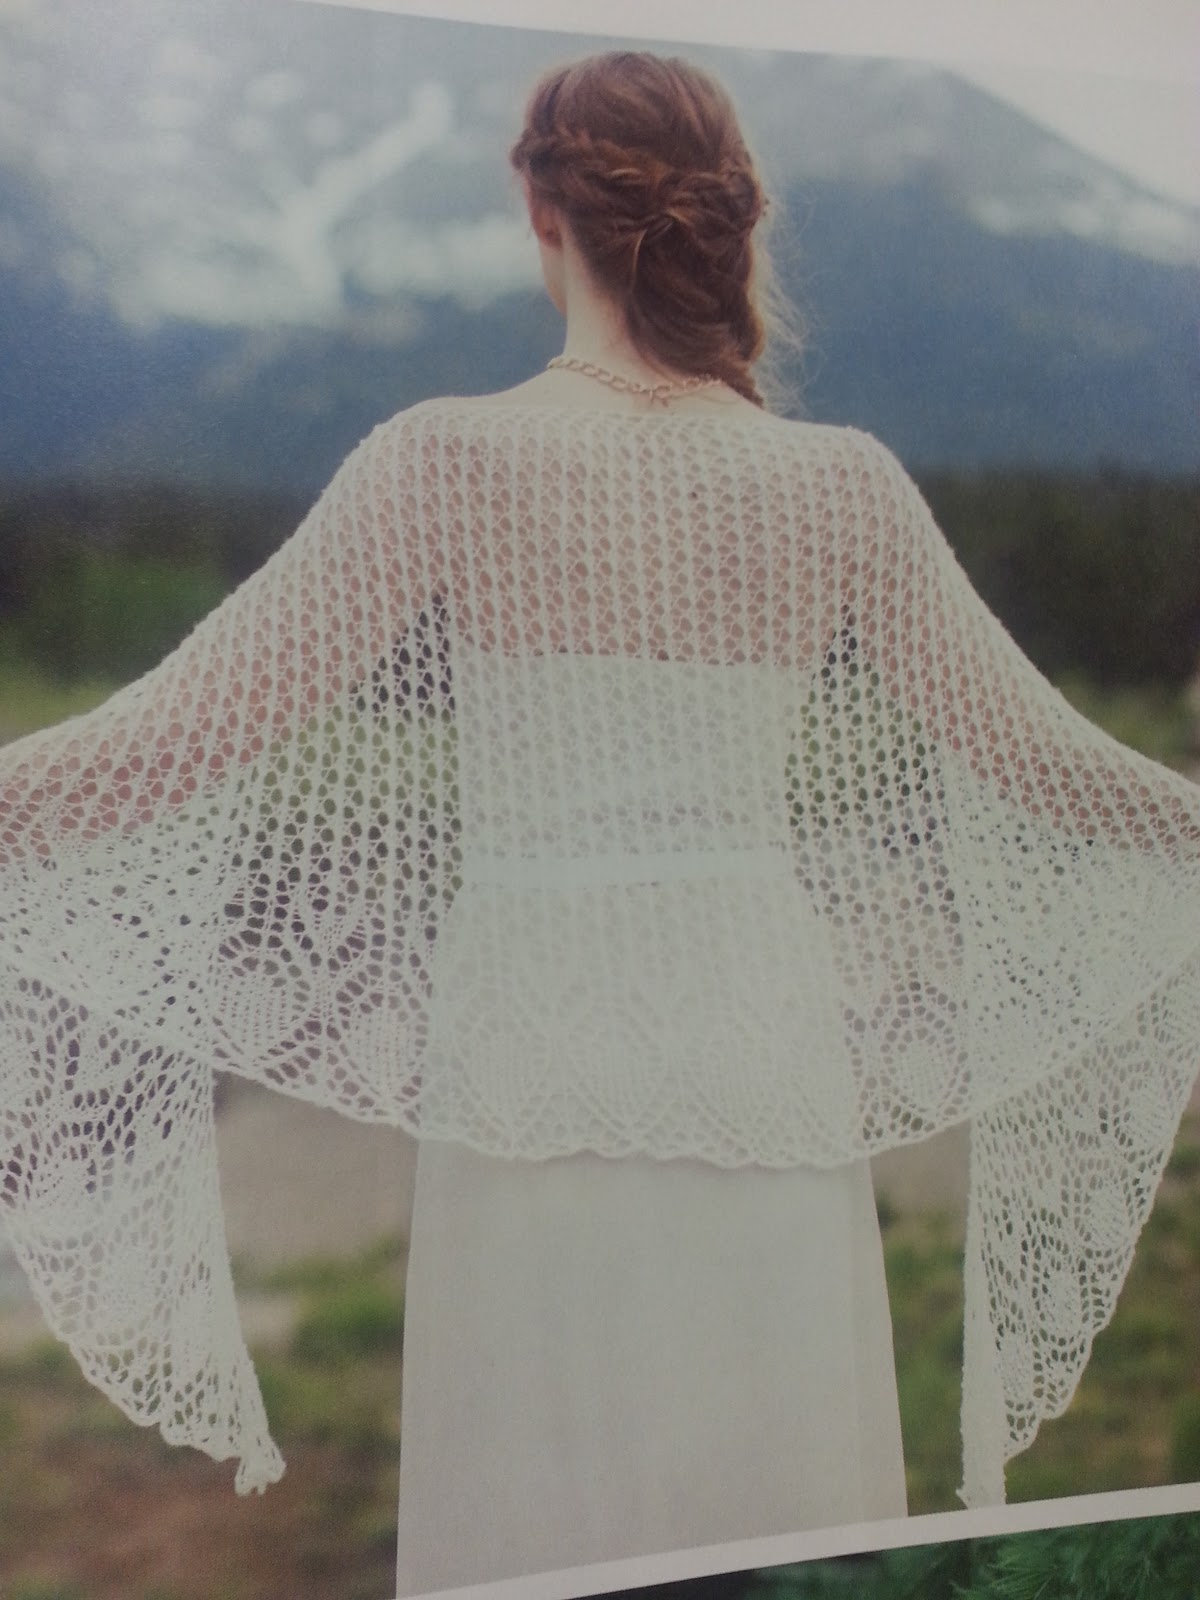 Vogue Knitting Winter 2016 : Knitting tangled yarns tangledmania magazine review